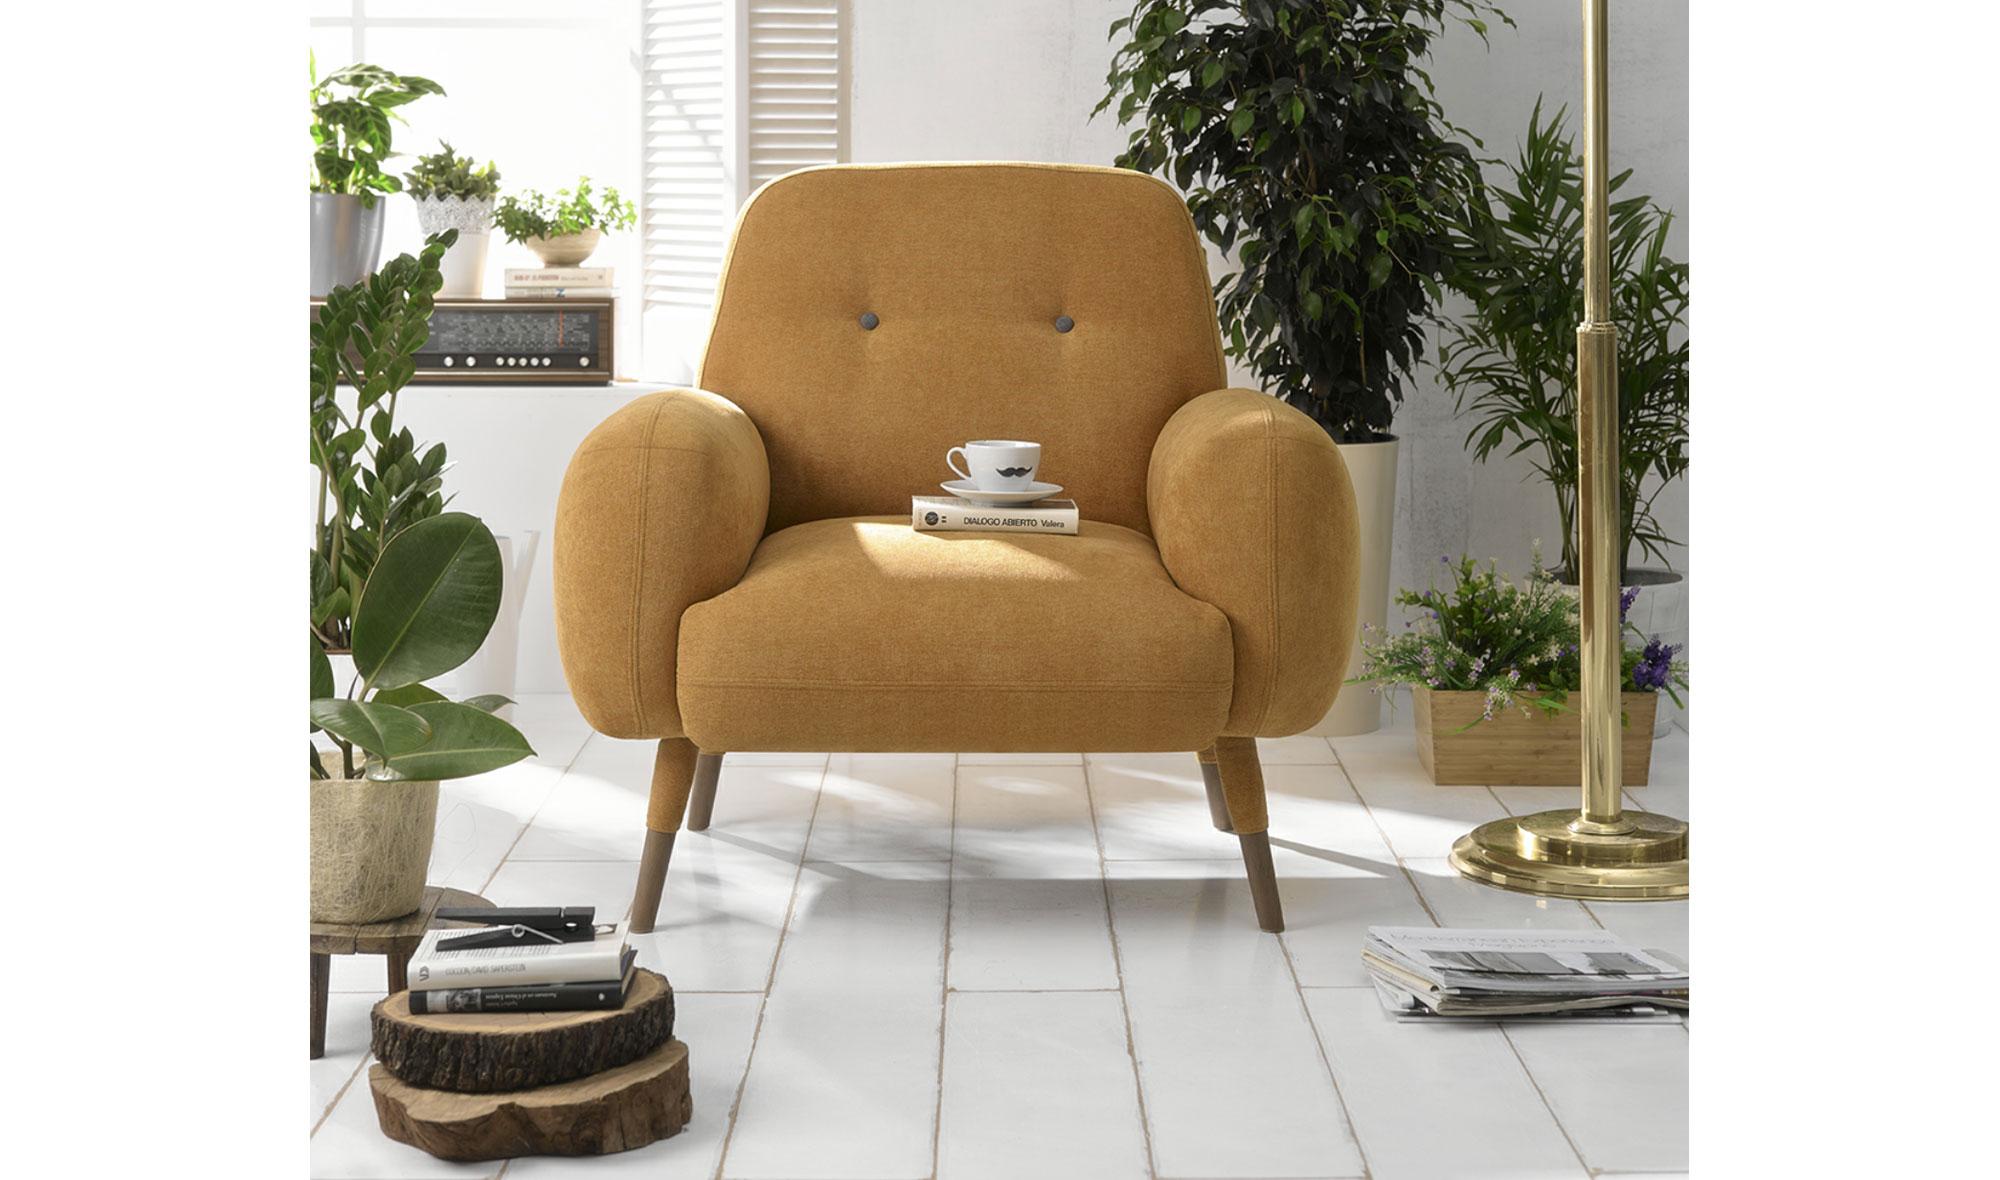 Butaca Moderna Kinsey De Lujo En Portobellodeluxe Com Tu Tienda  # Muebles Butacas Modernas